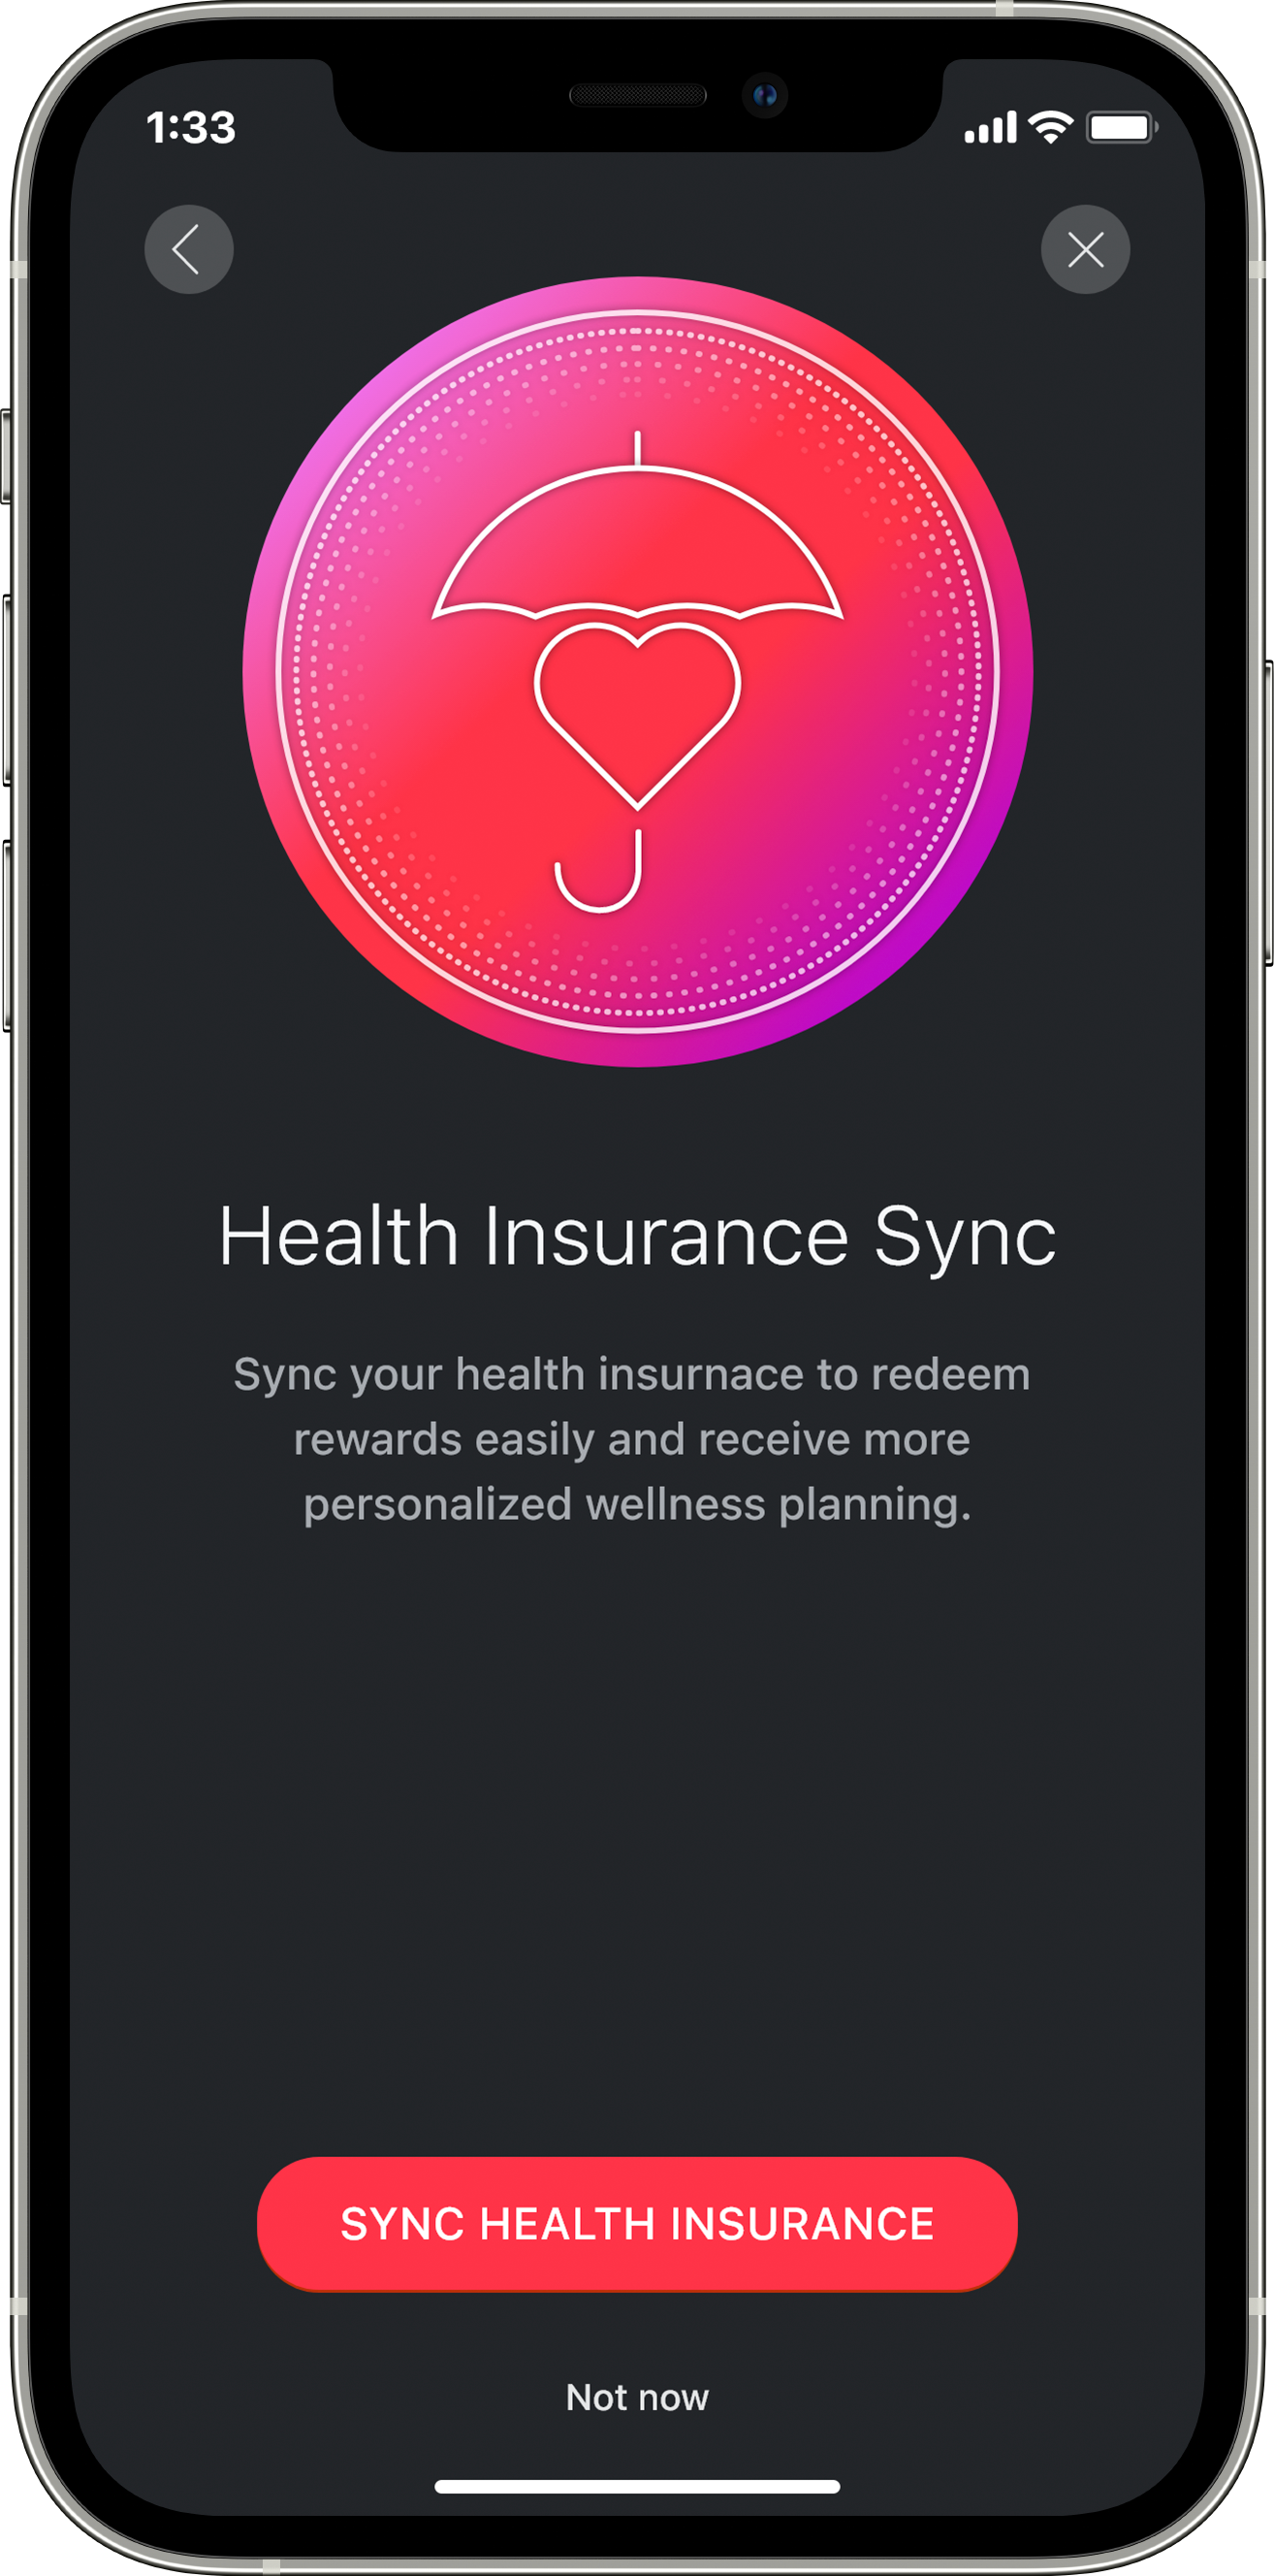 The health insurance sync screen.